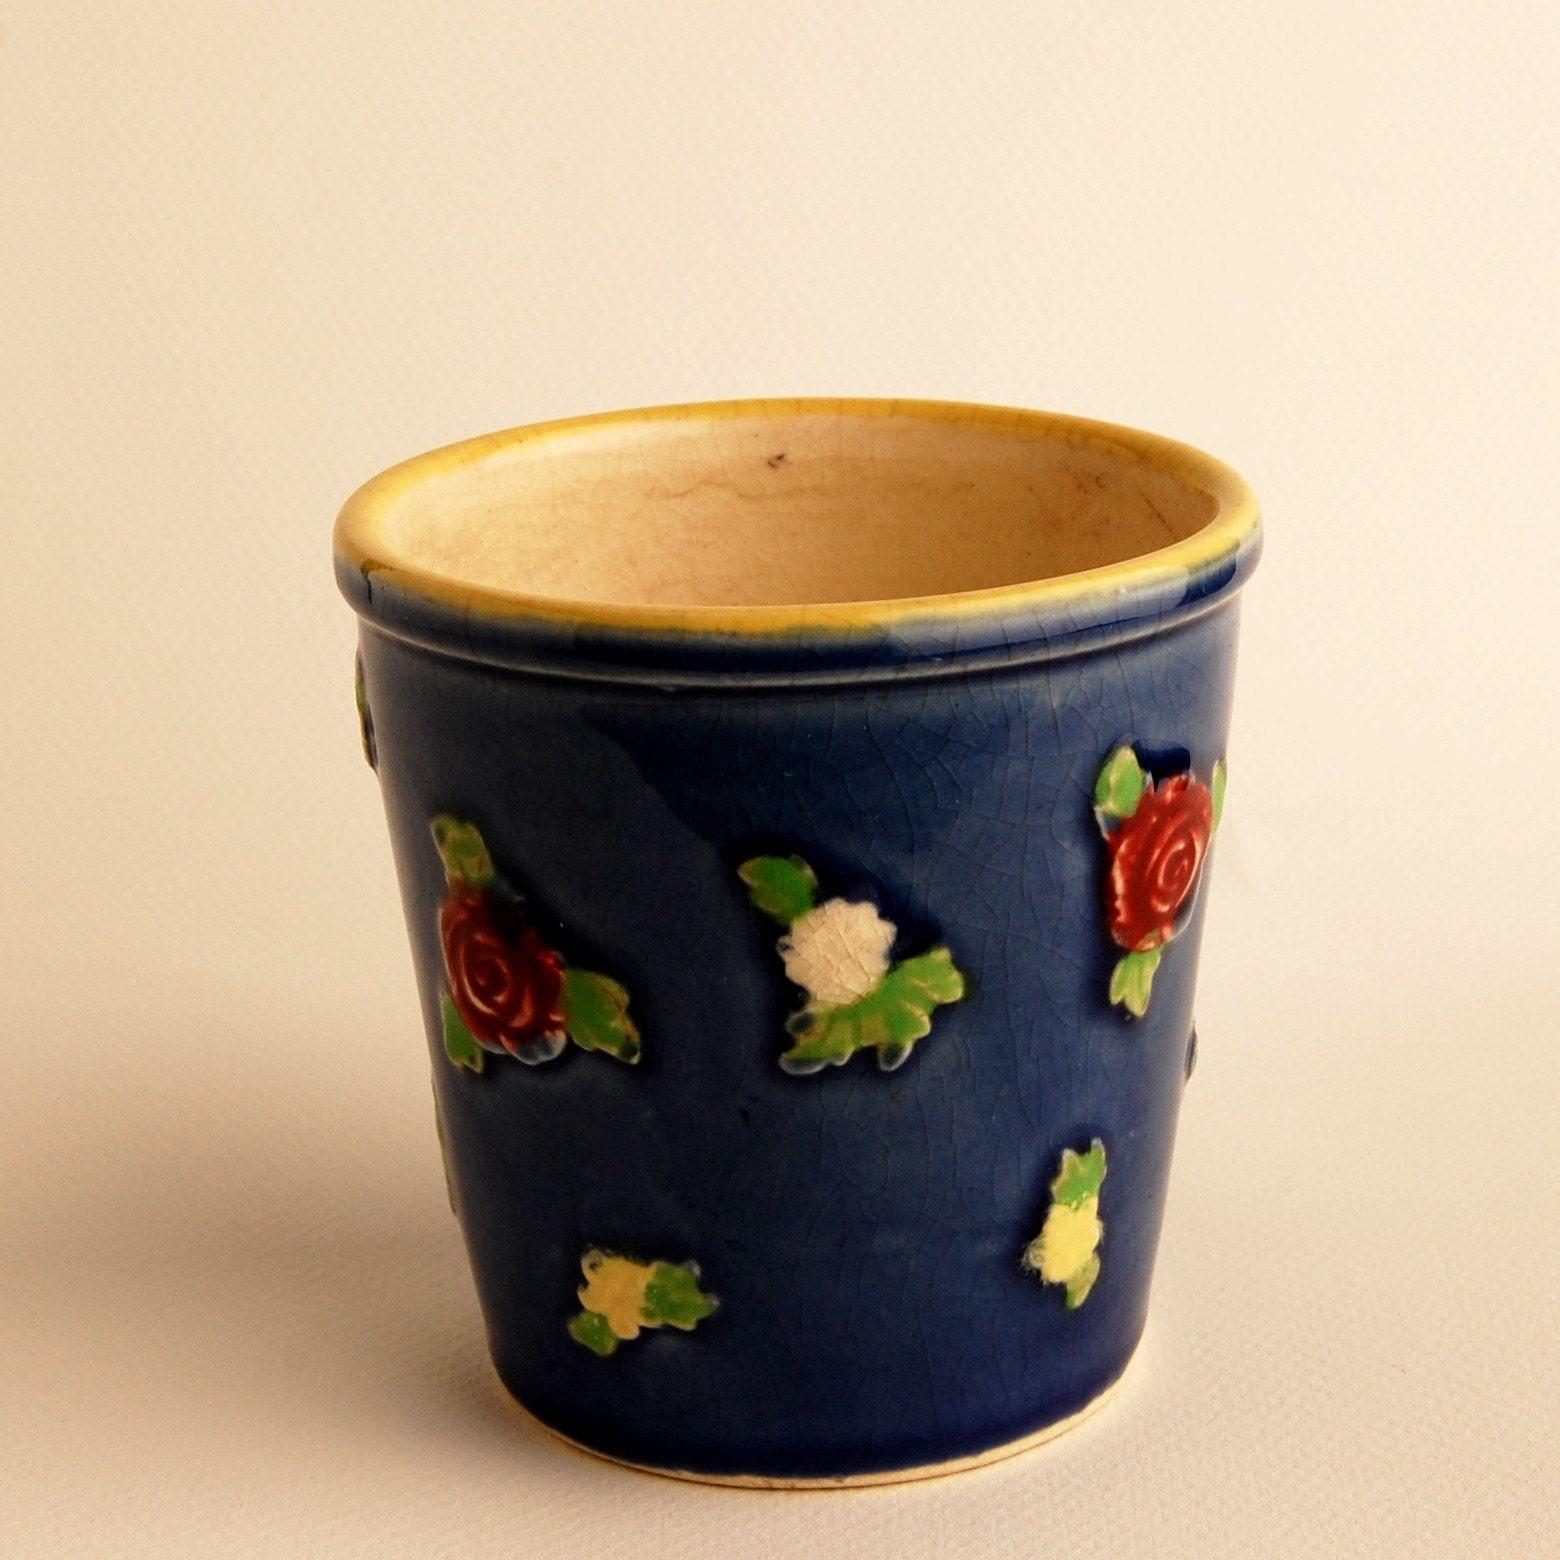 Vintage Japanese Majolica Flower Pot 1930's By Simplycoolstuff